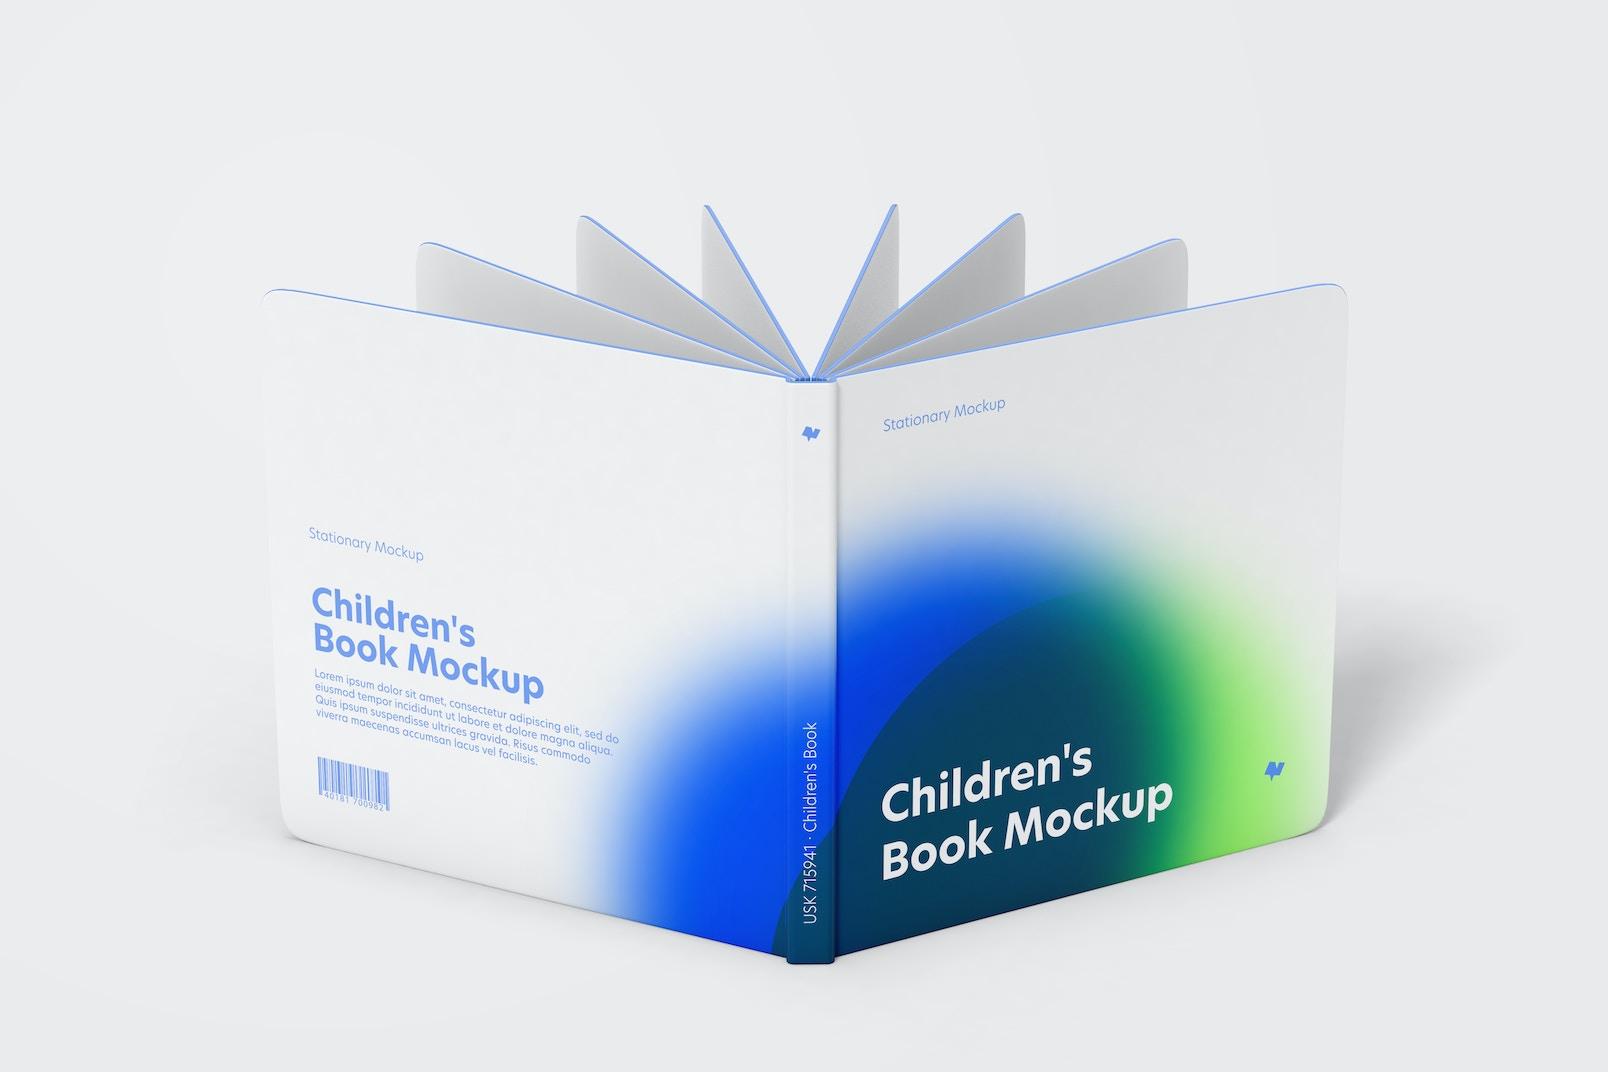 Children's Book Mockup, Opened